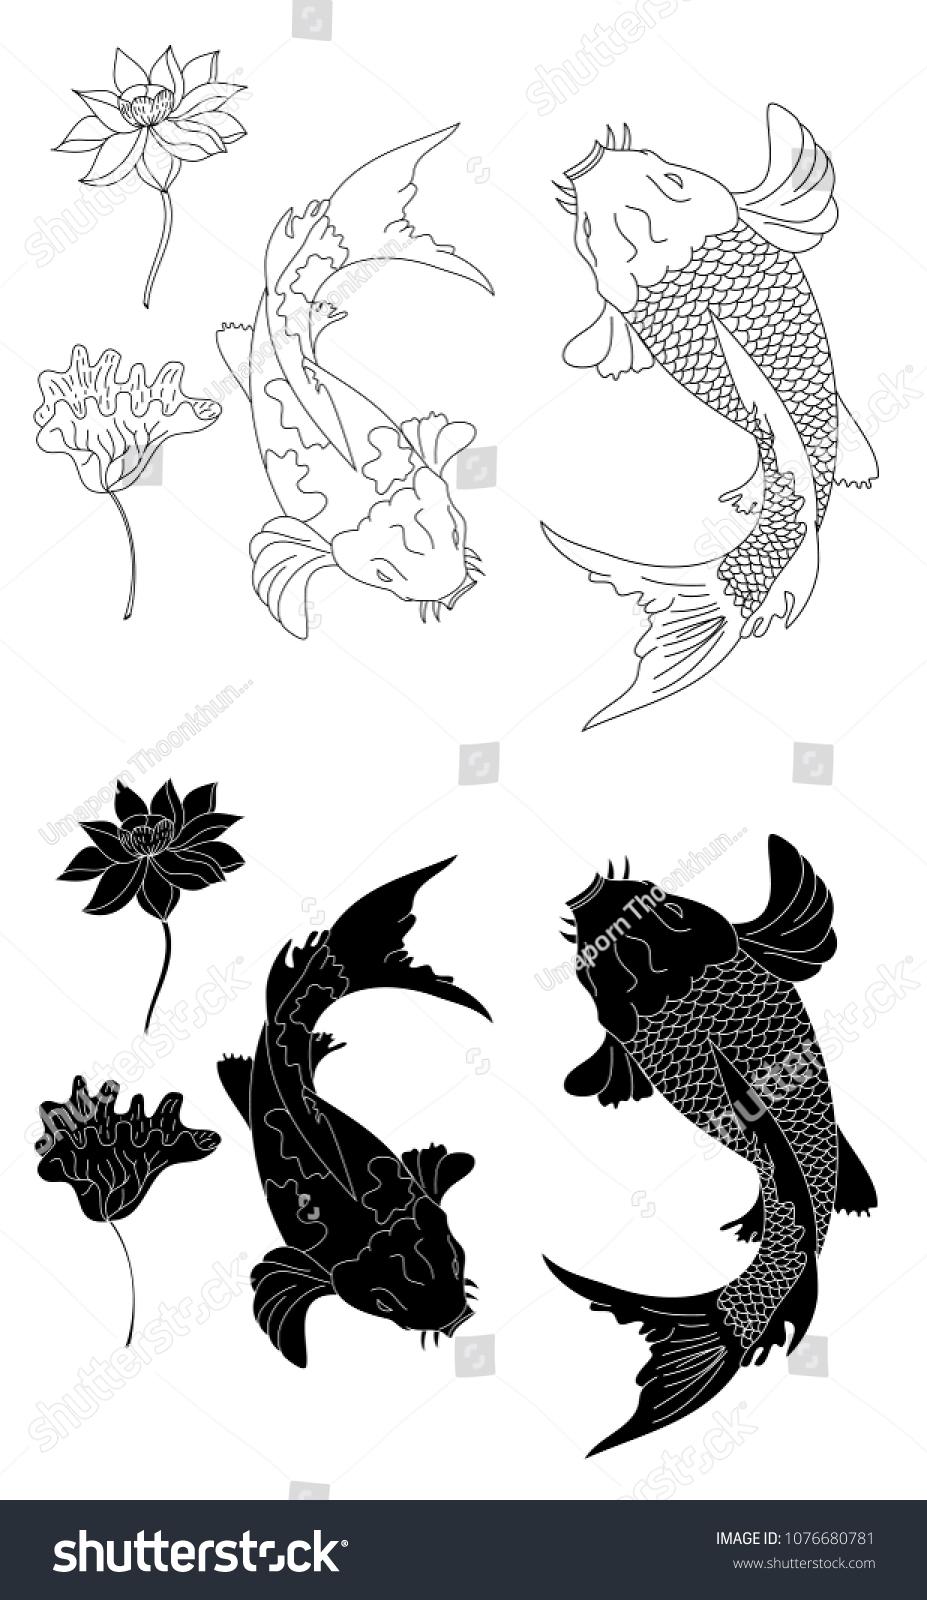 Gold koi fish lotus flower tattoo stock vector 1076680781 shutterstock gold koi fish and lotus flower for tattoo designinese koi carp isolate vector izmirmasajfo